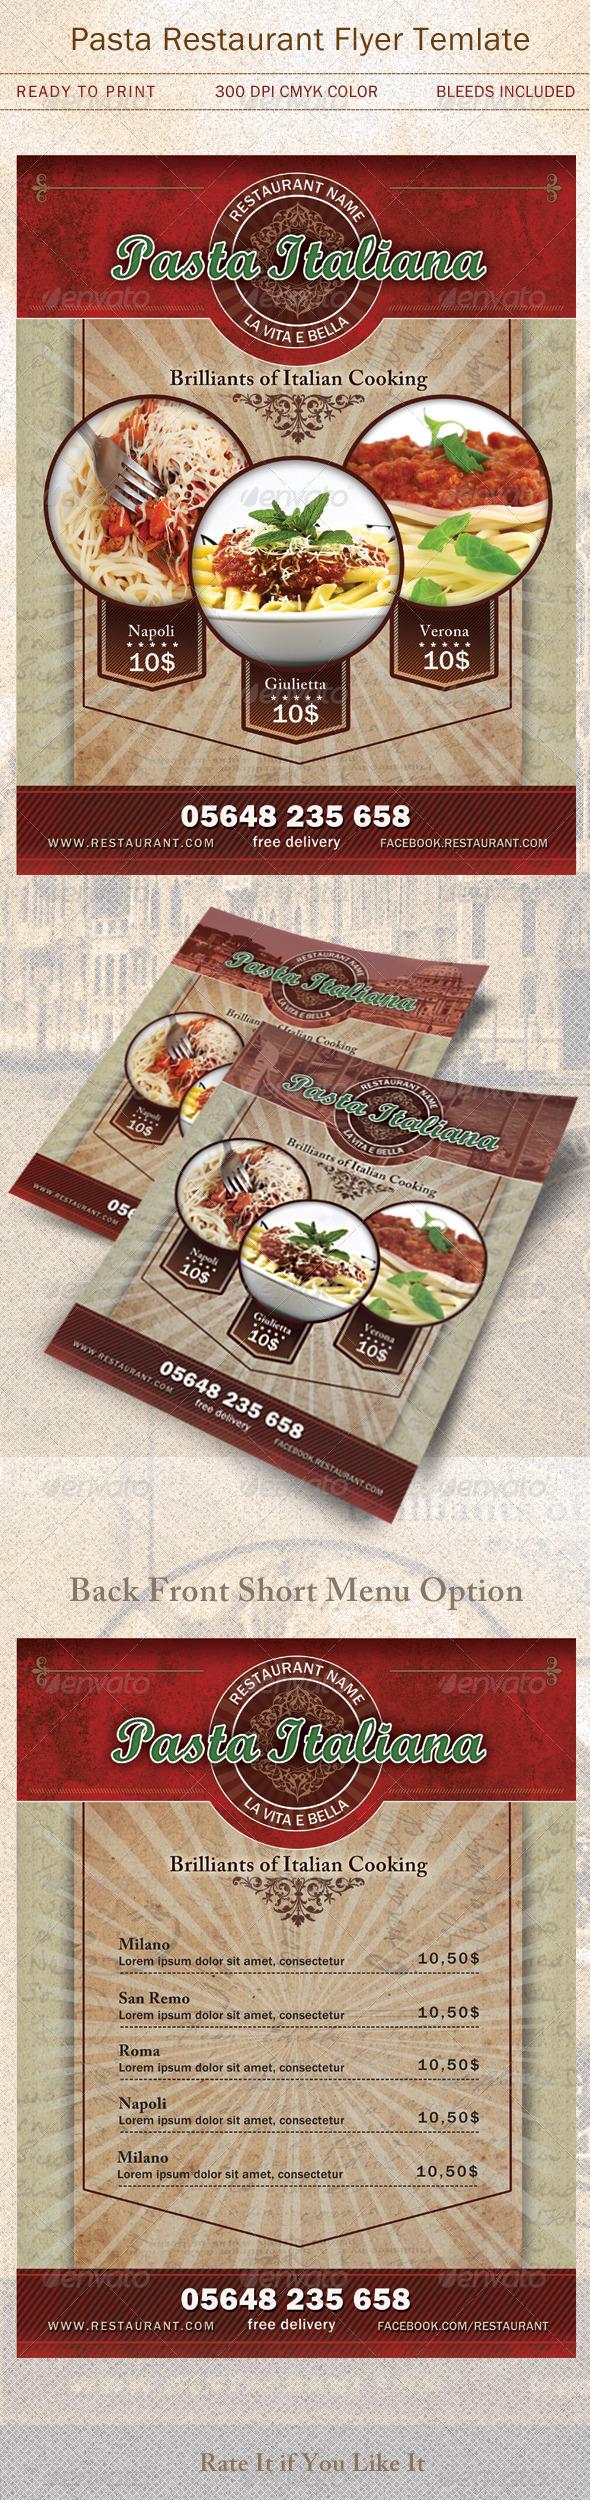 Pasta Restaurant Flyer Template